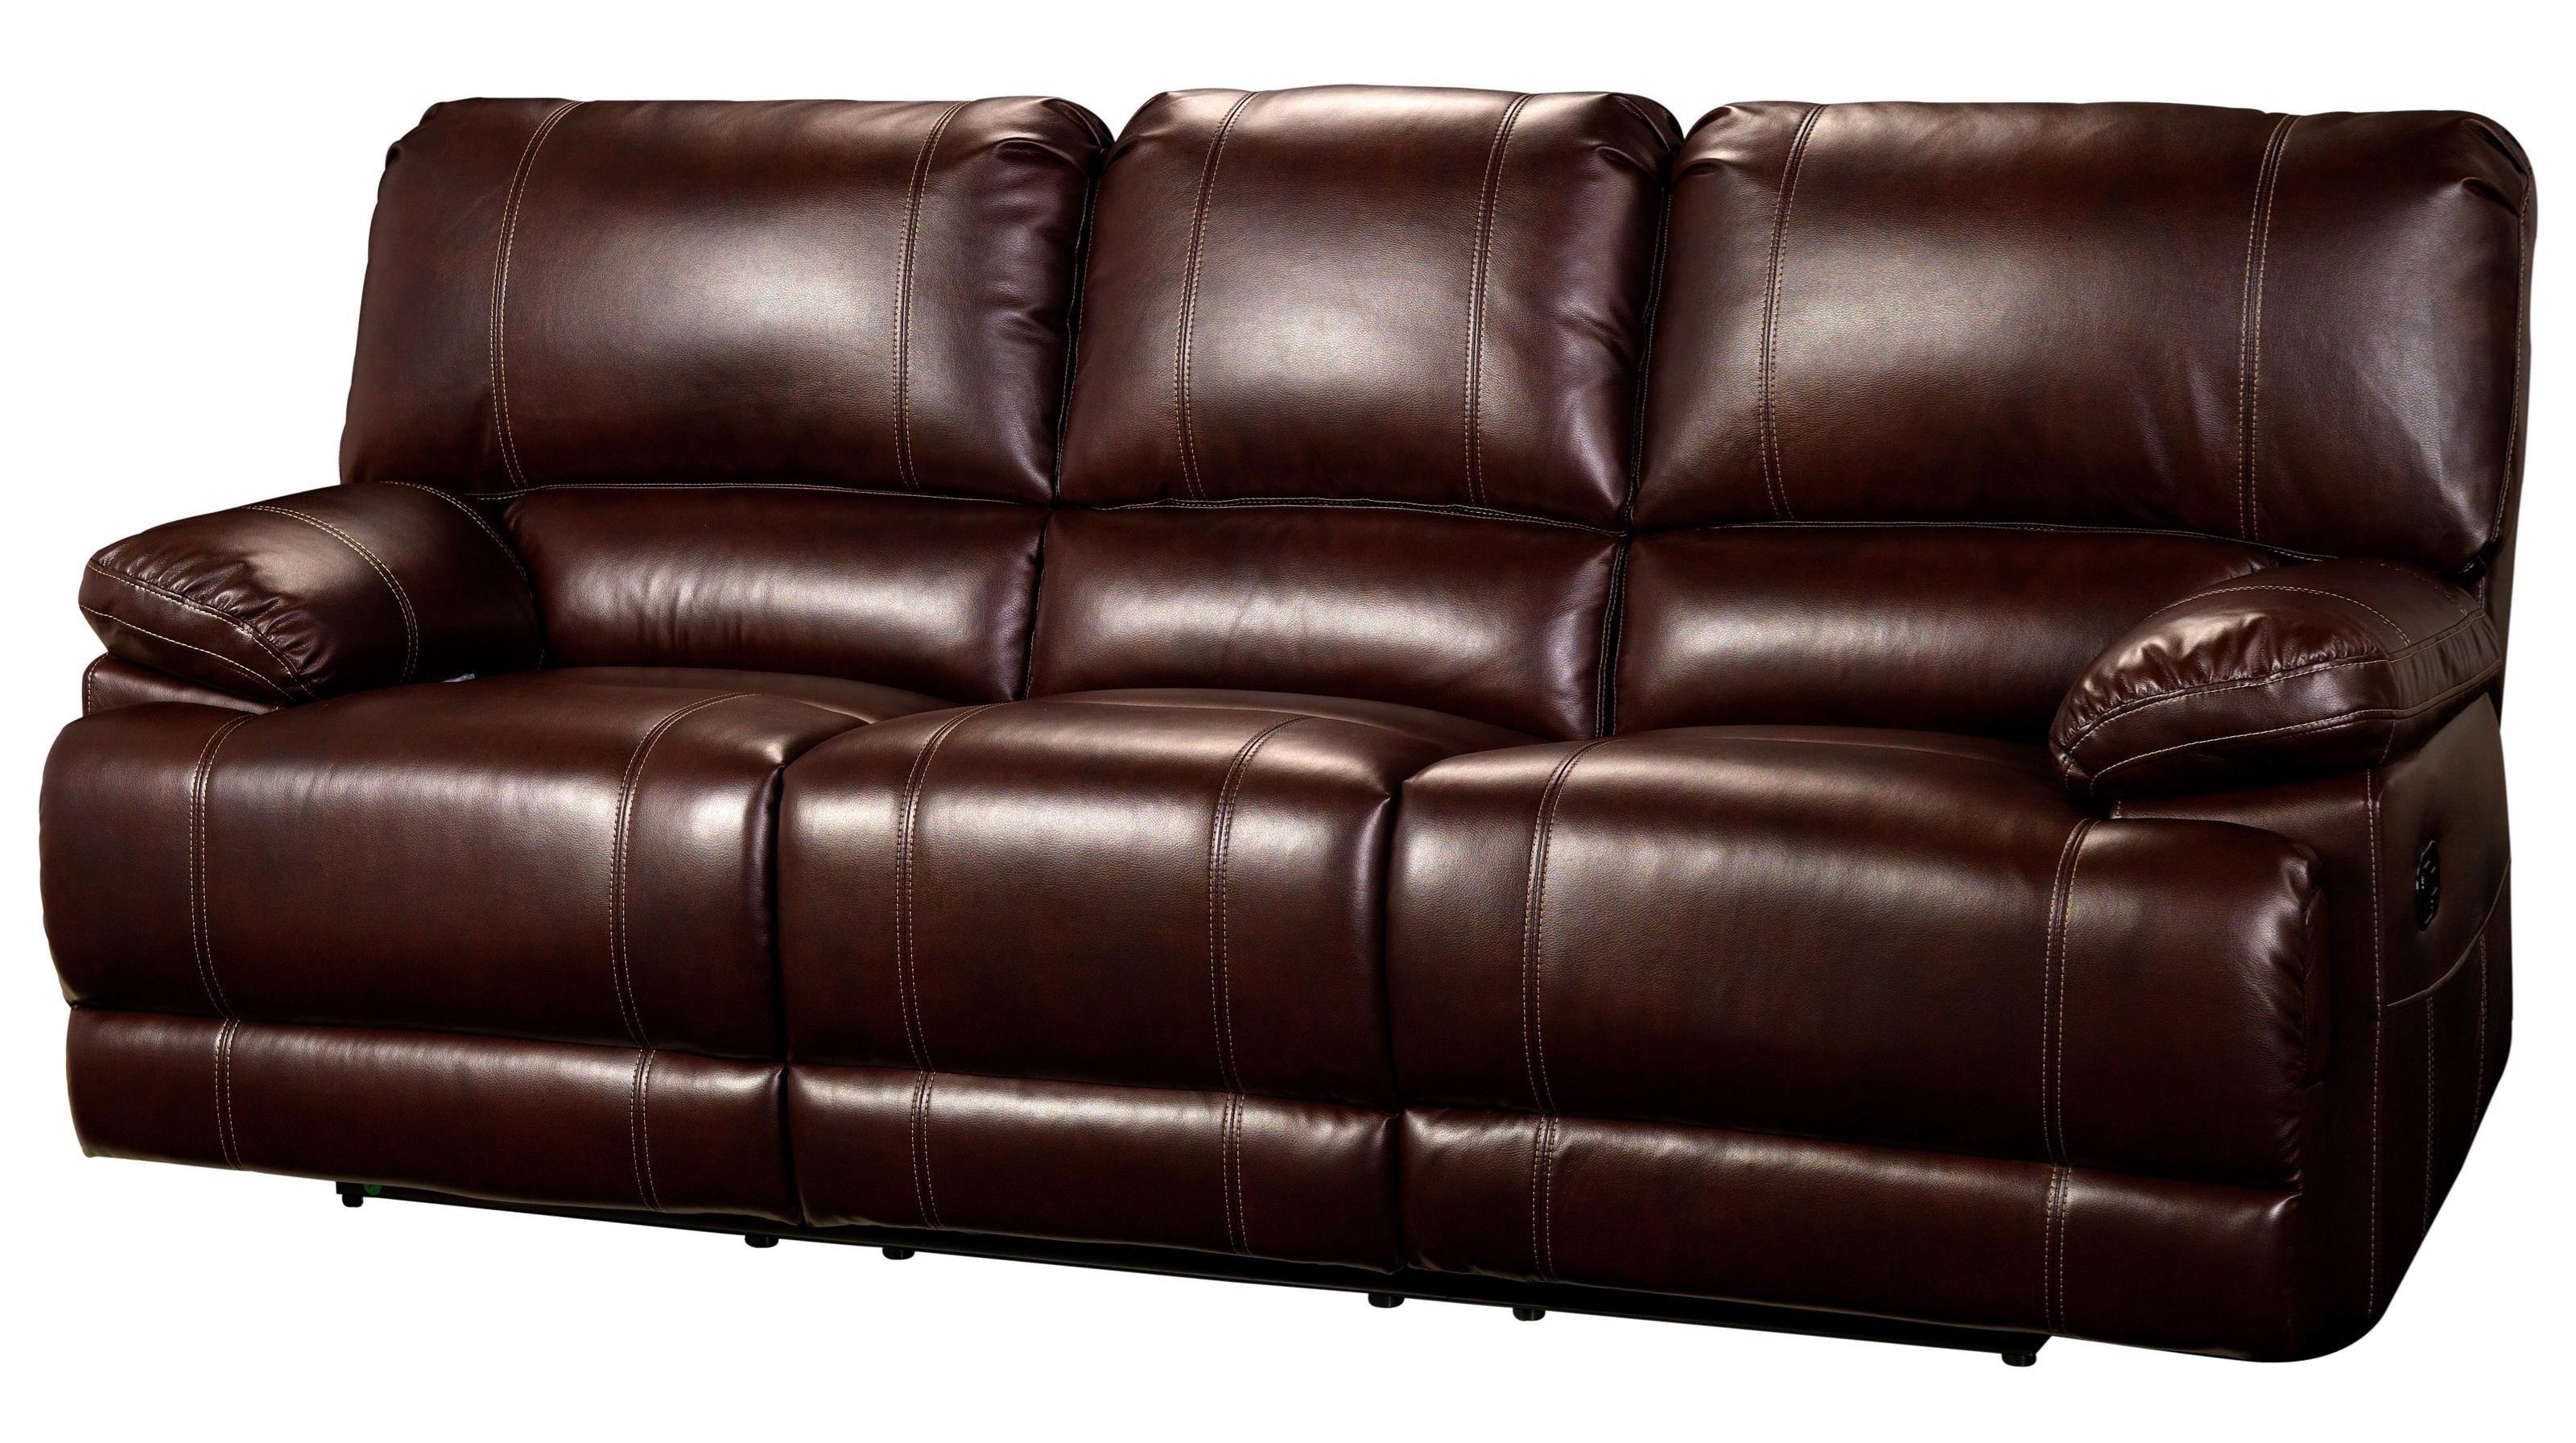 New Classic WyomingPower Dual Recliner Sofa ...